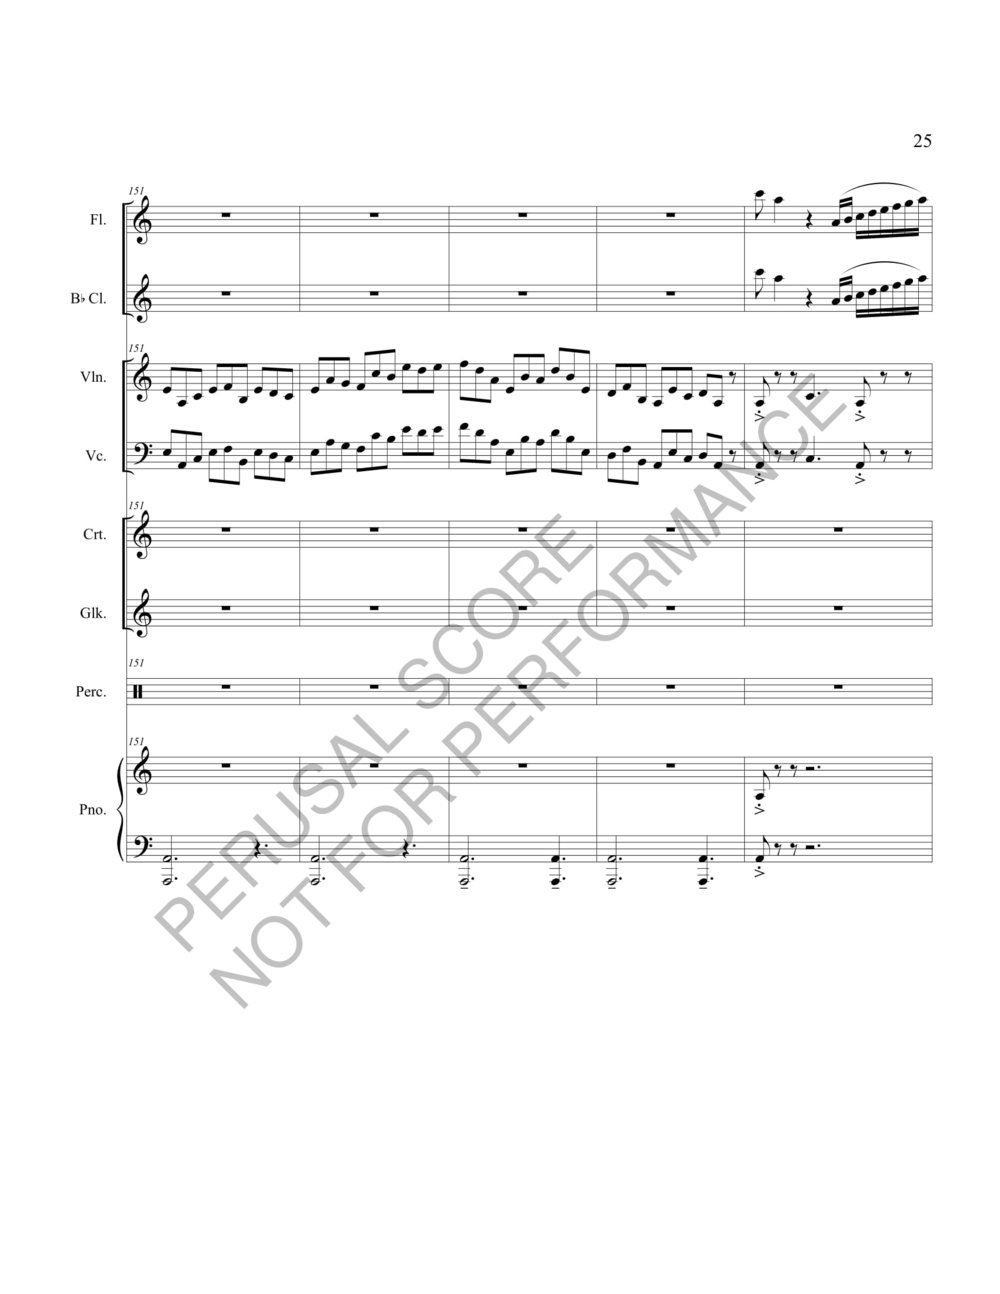 Boyd Terra Liberi Score-watermark-31.jpg